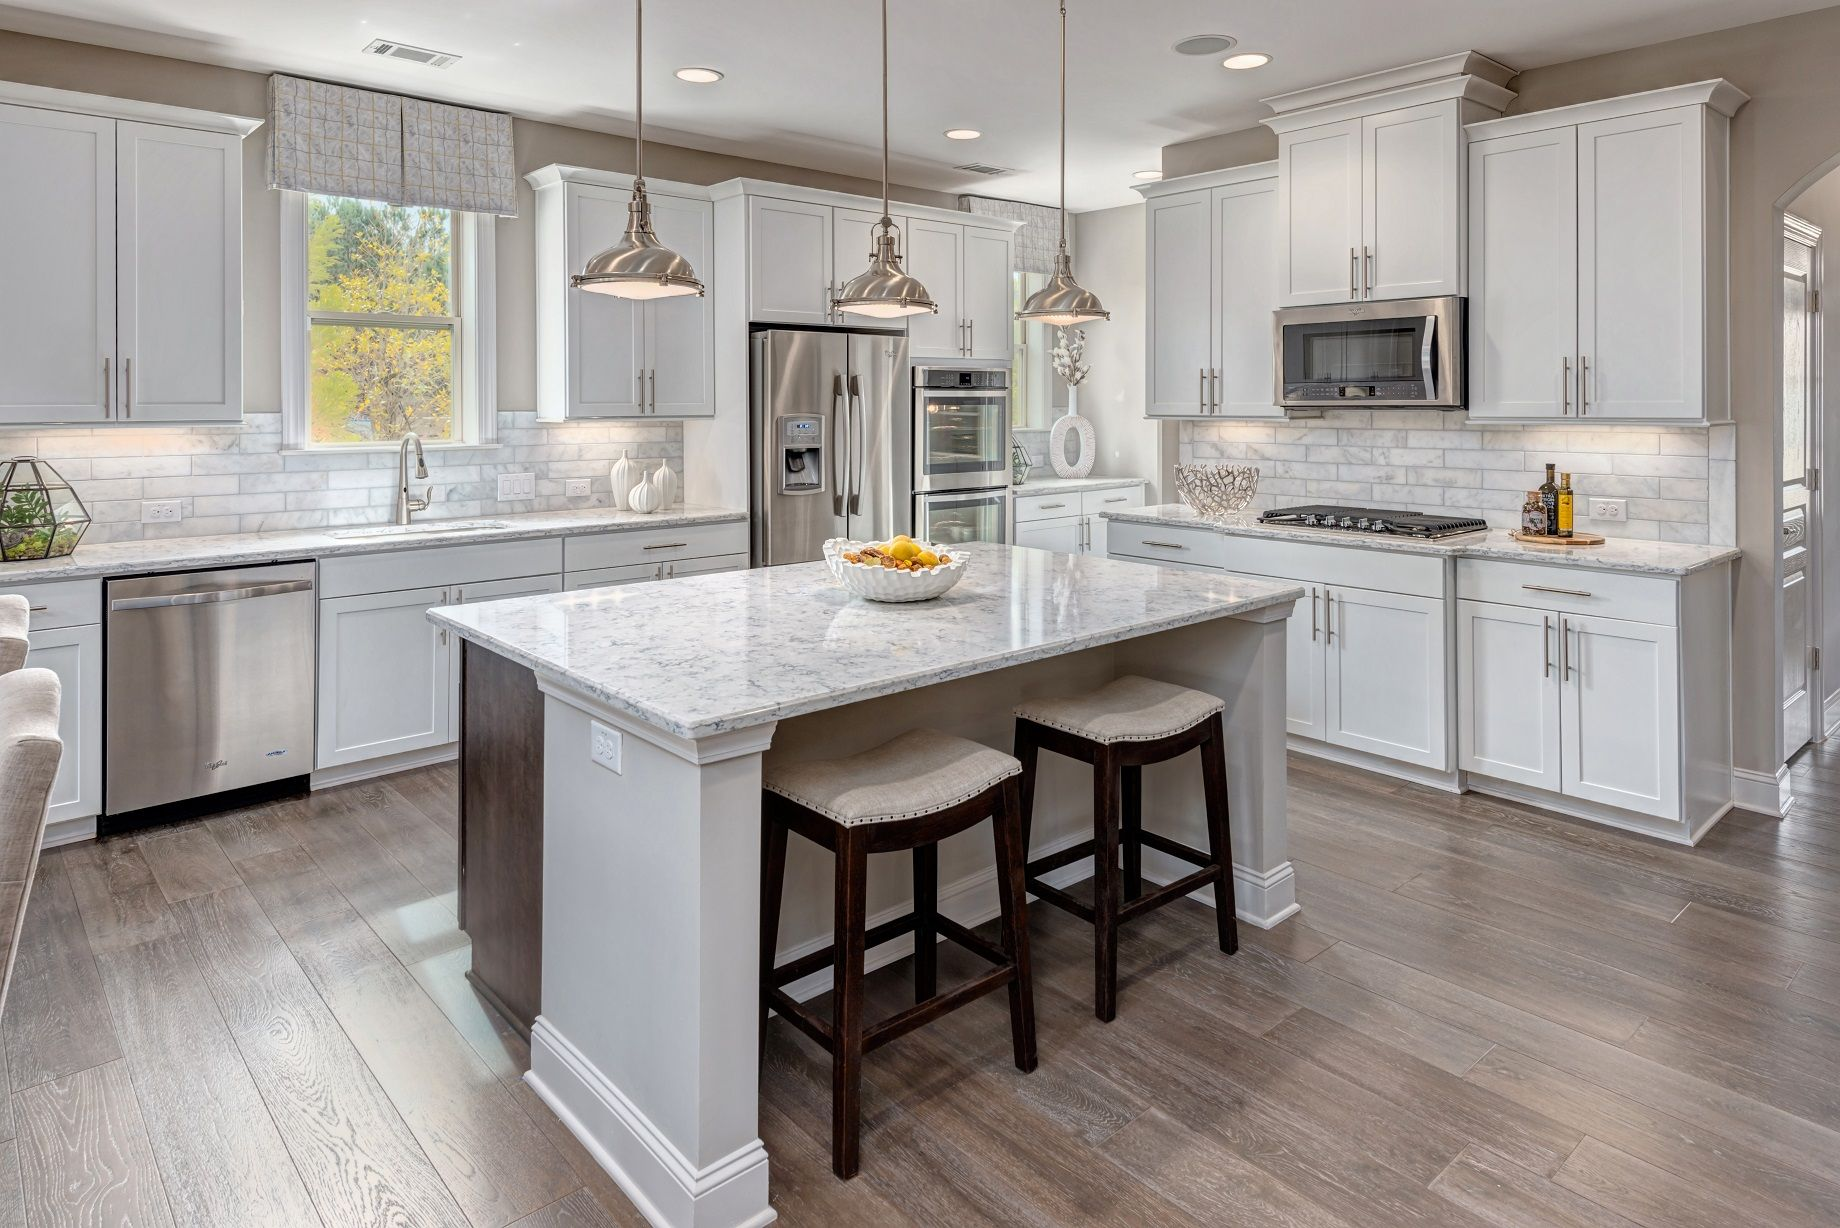 Superb CalAtlantic Homes Featuring Fresnel Pendants By Progress Lighting · Palm  DesertNew KitchenSpace ...